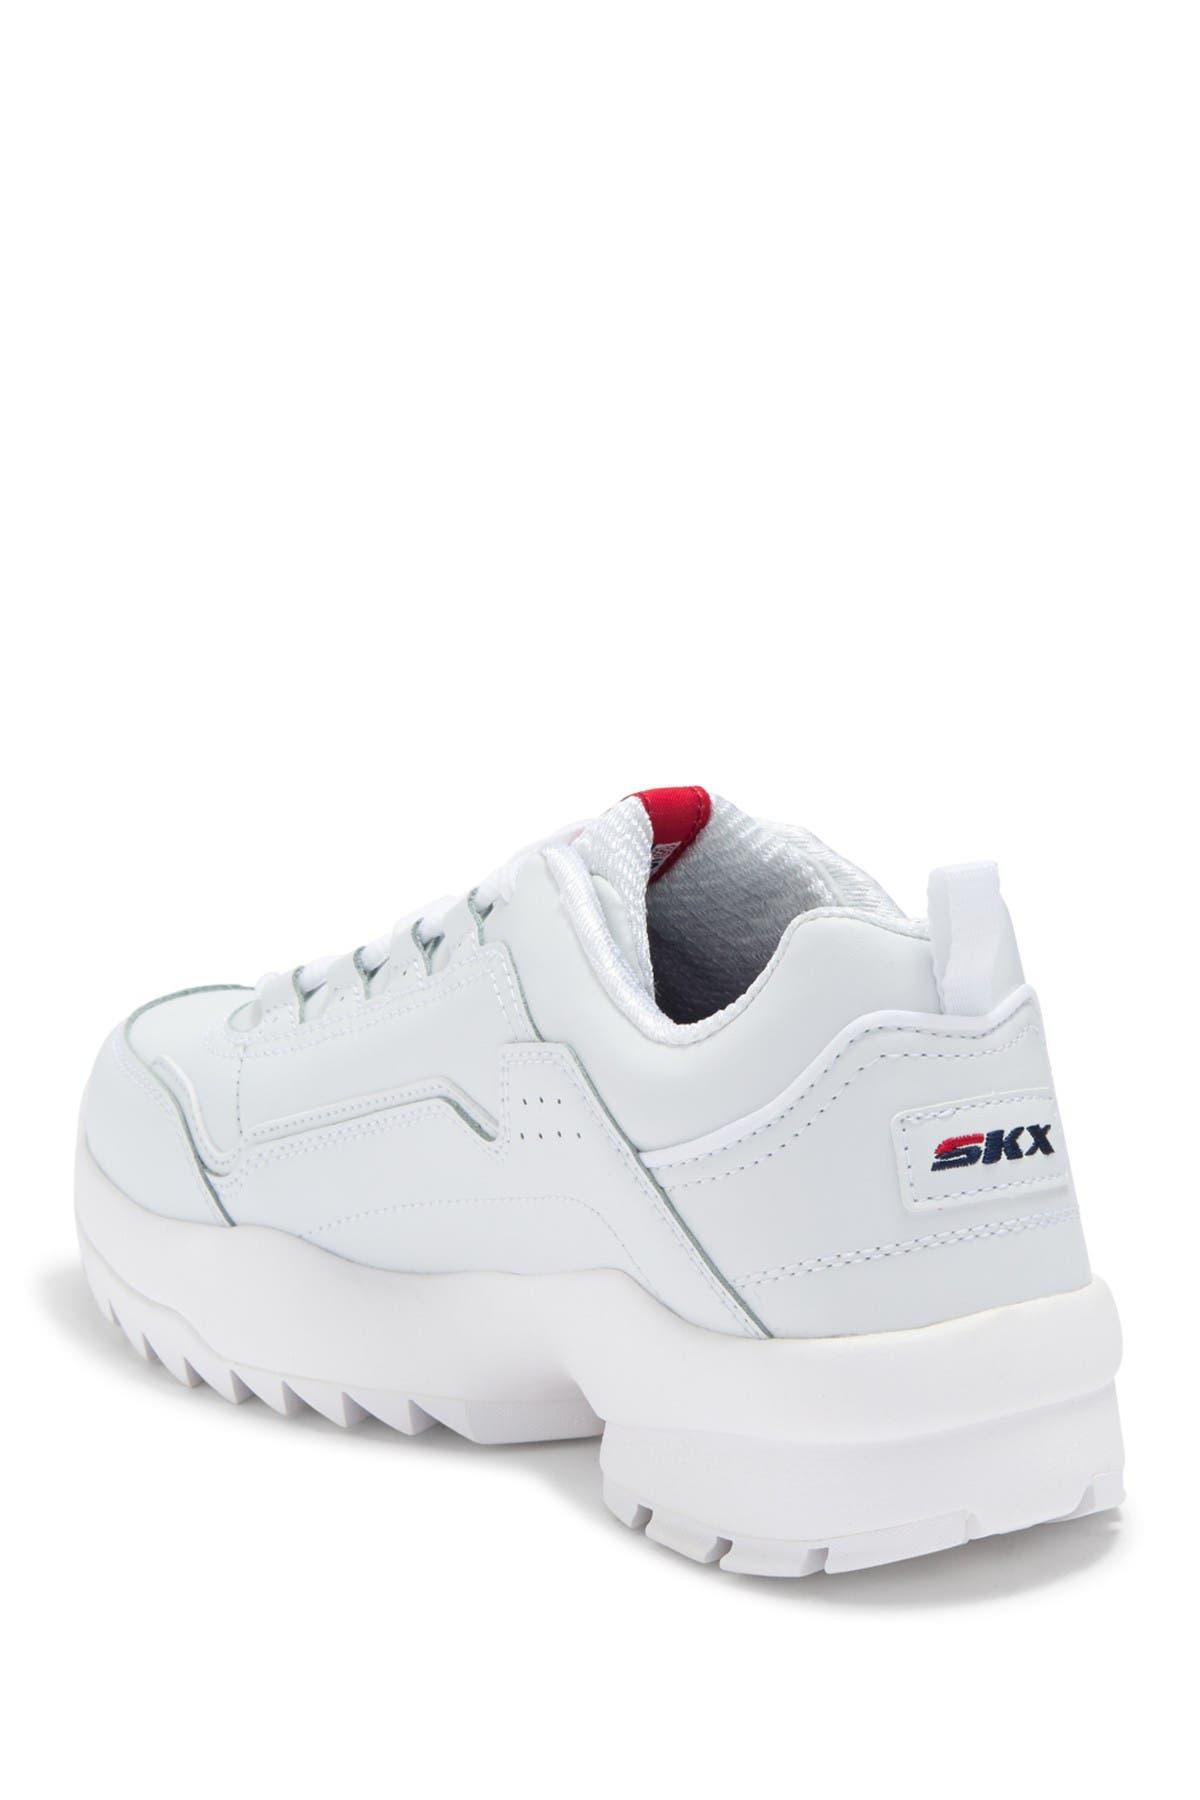 Image of Skechers Tidao SKX Sport Sneaker